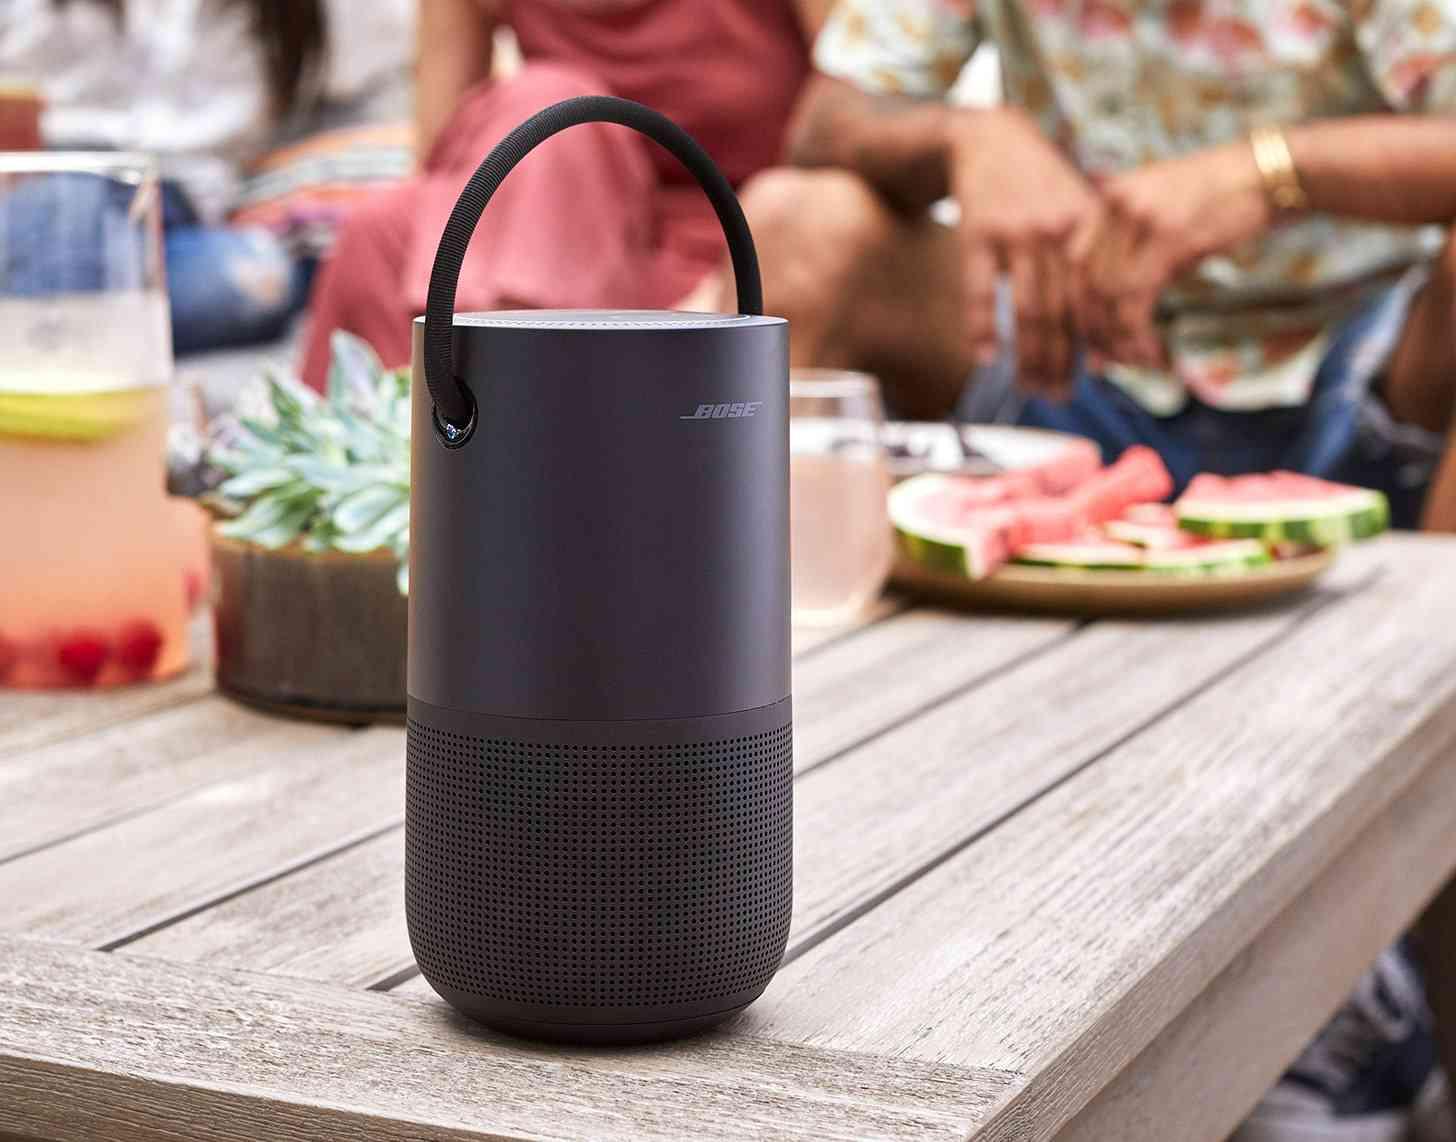 Bose Portable Home Speaker official